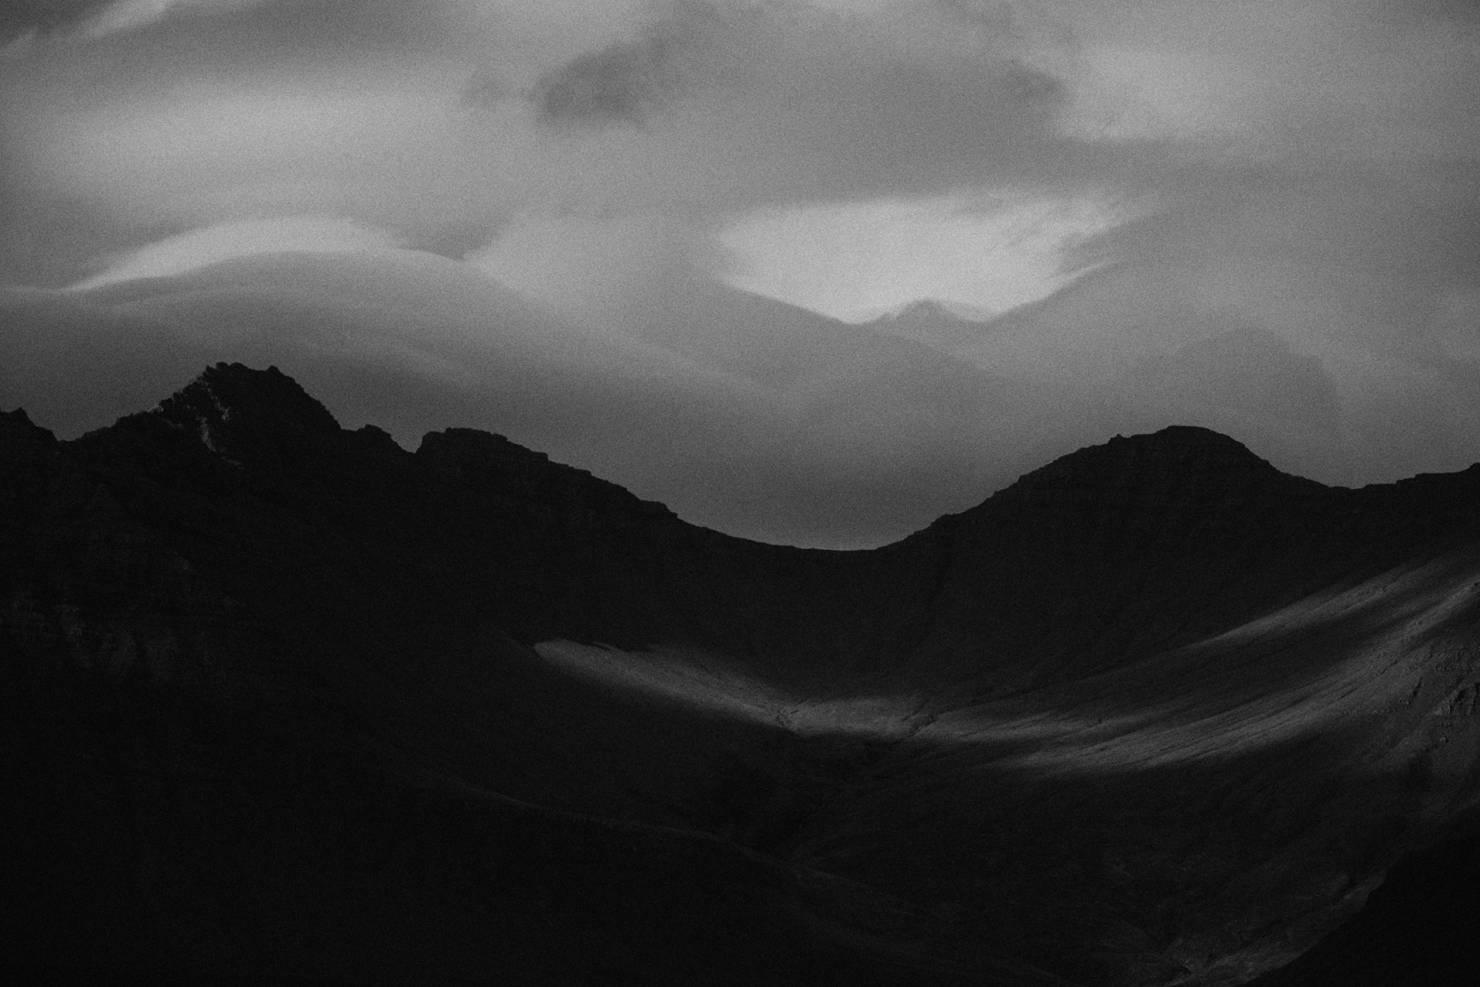 patrick_schuttler_landscape_iceland_011-3744c4f337d9f612c43d8e90afd66902